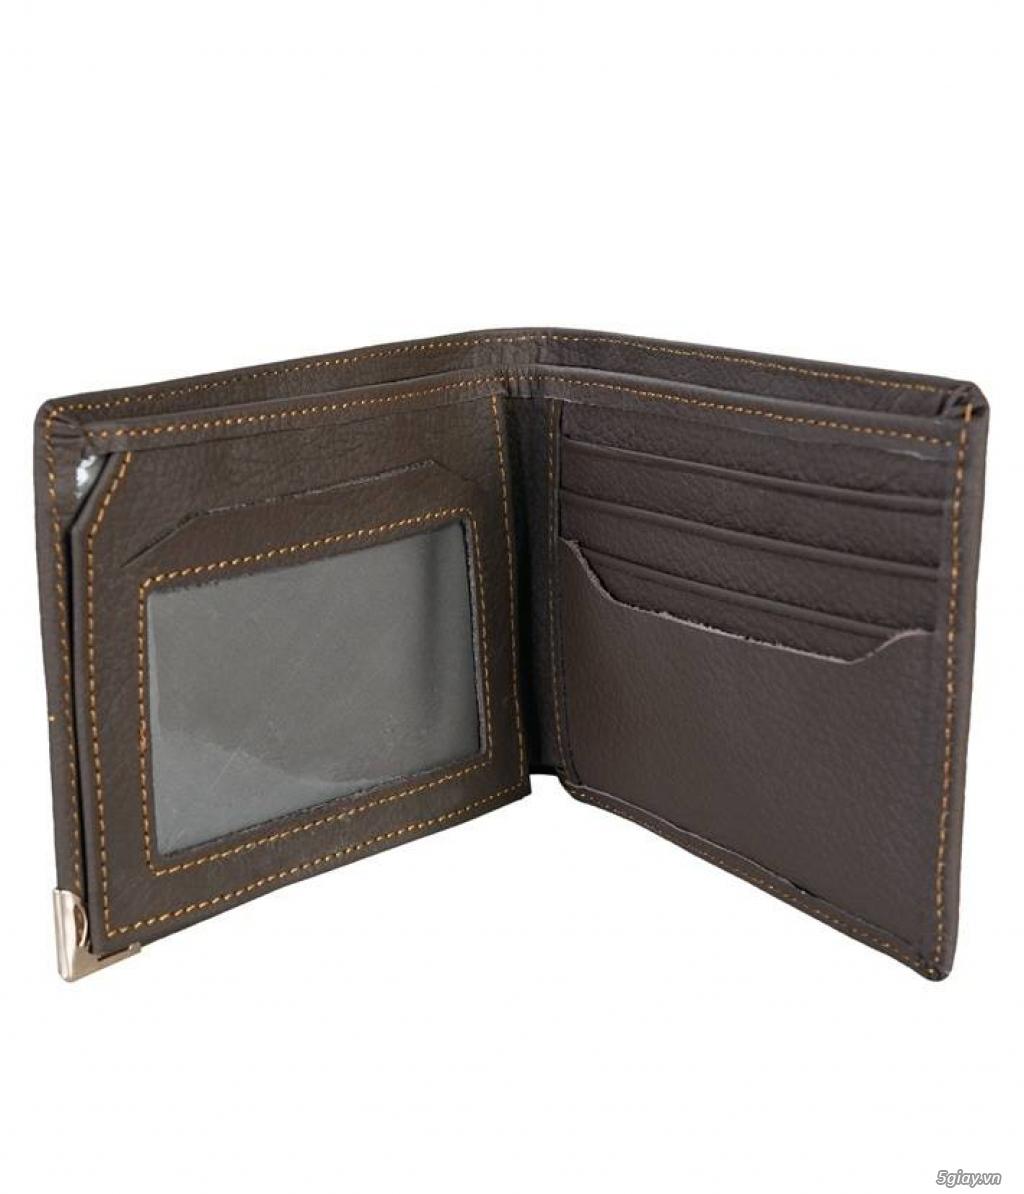 Khai Trương Shop Bóp Ví, Thắt Lưng Da Leather Wolrd Big Sale 30% - 10